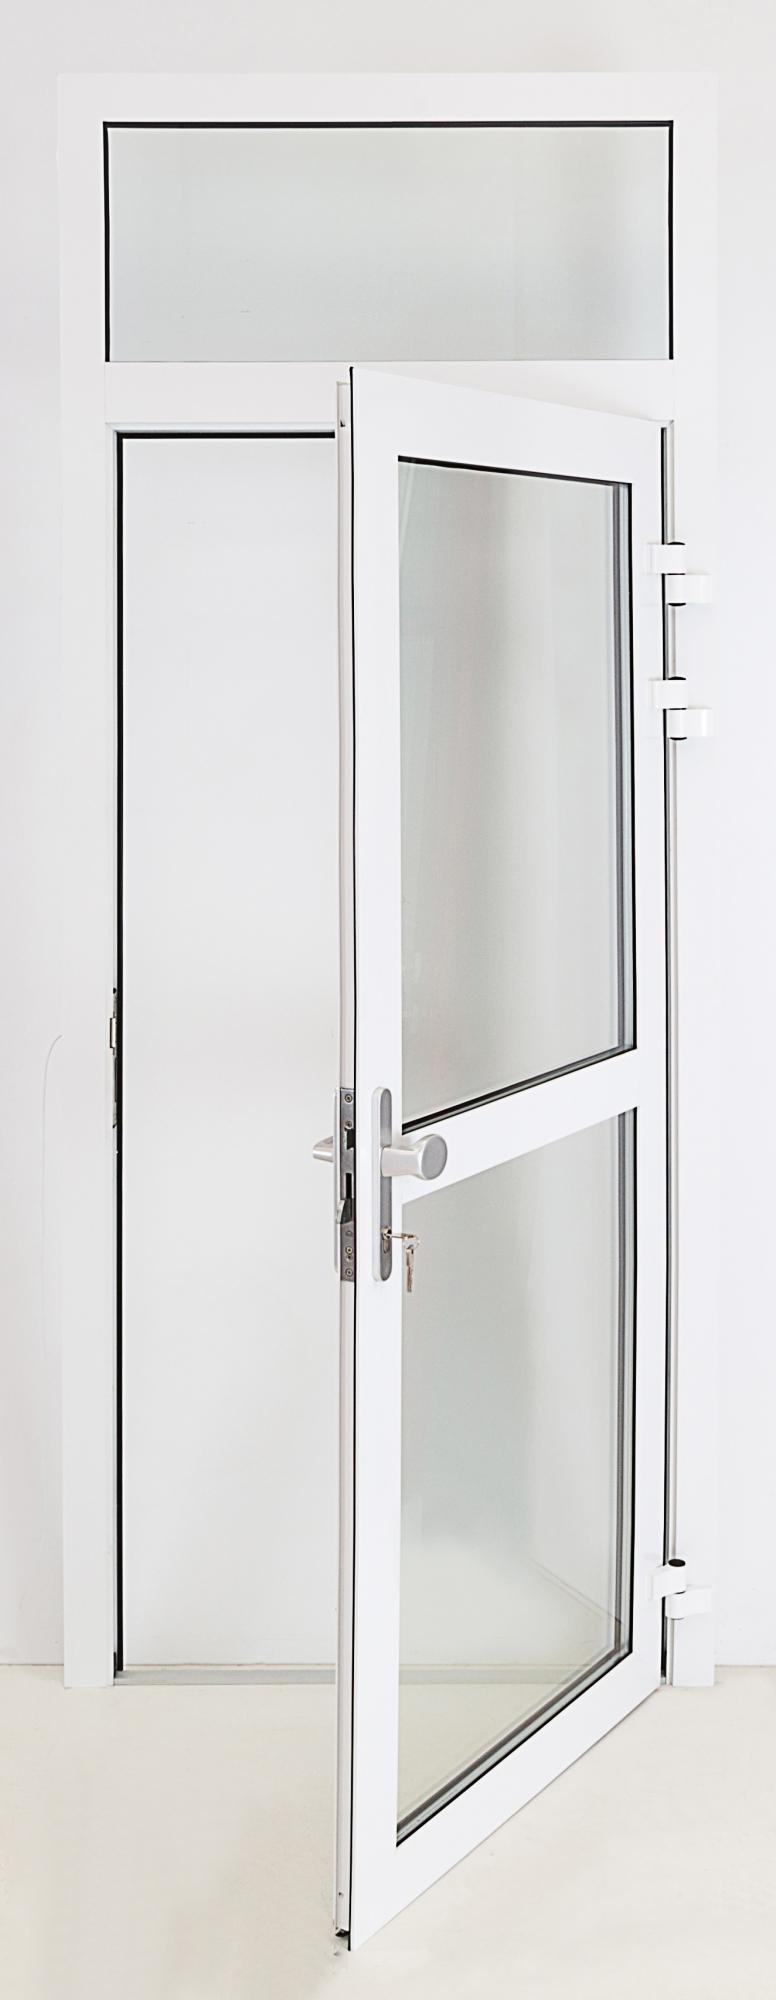 aluminium nebent r din re nach au en ol garagent r kellert r nebeneingangst r ebay. Black Bedroom Furniture Sets. Home Design Ideas